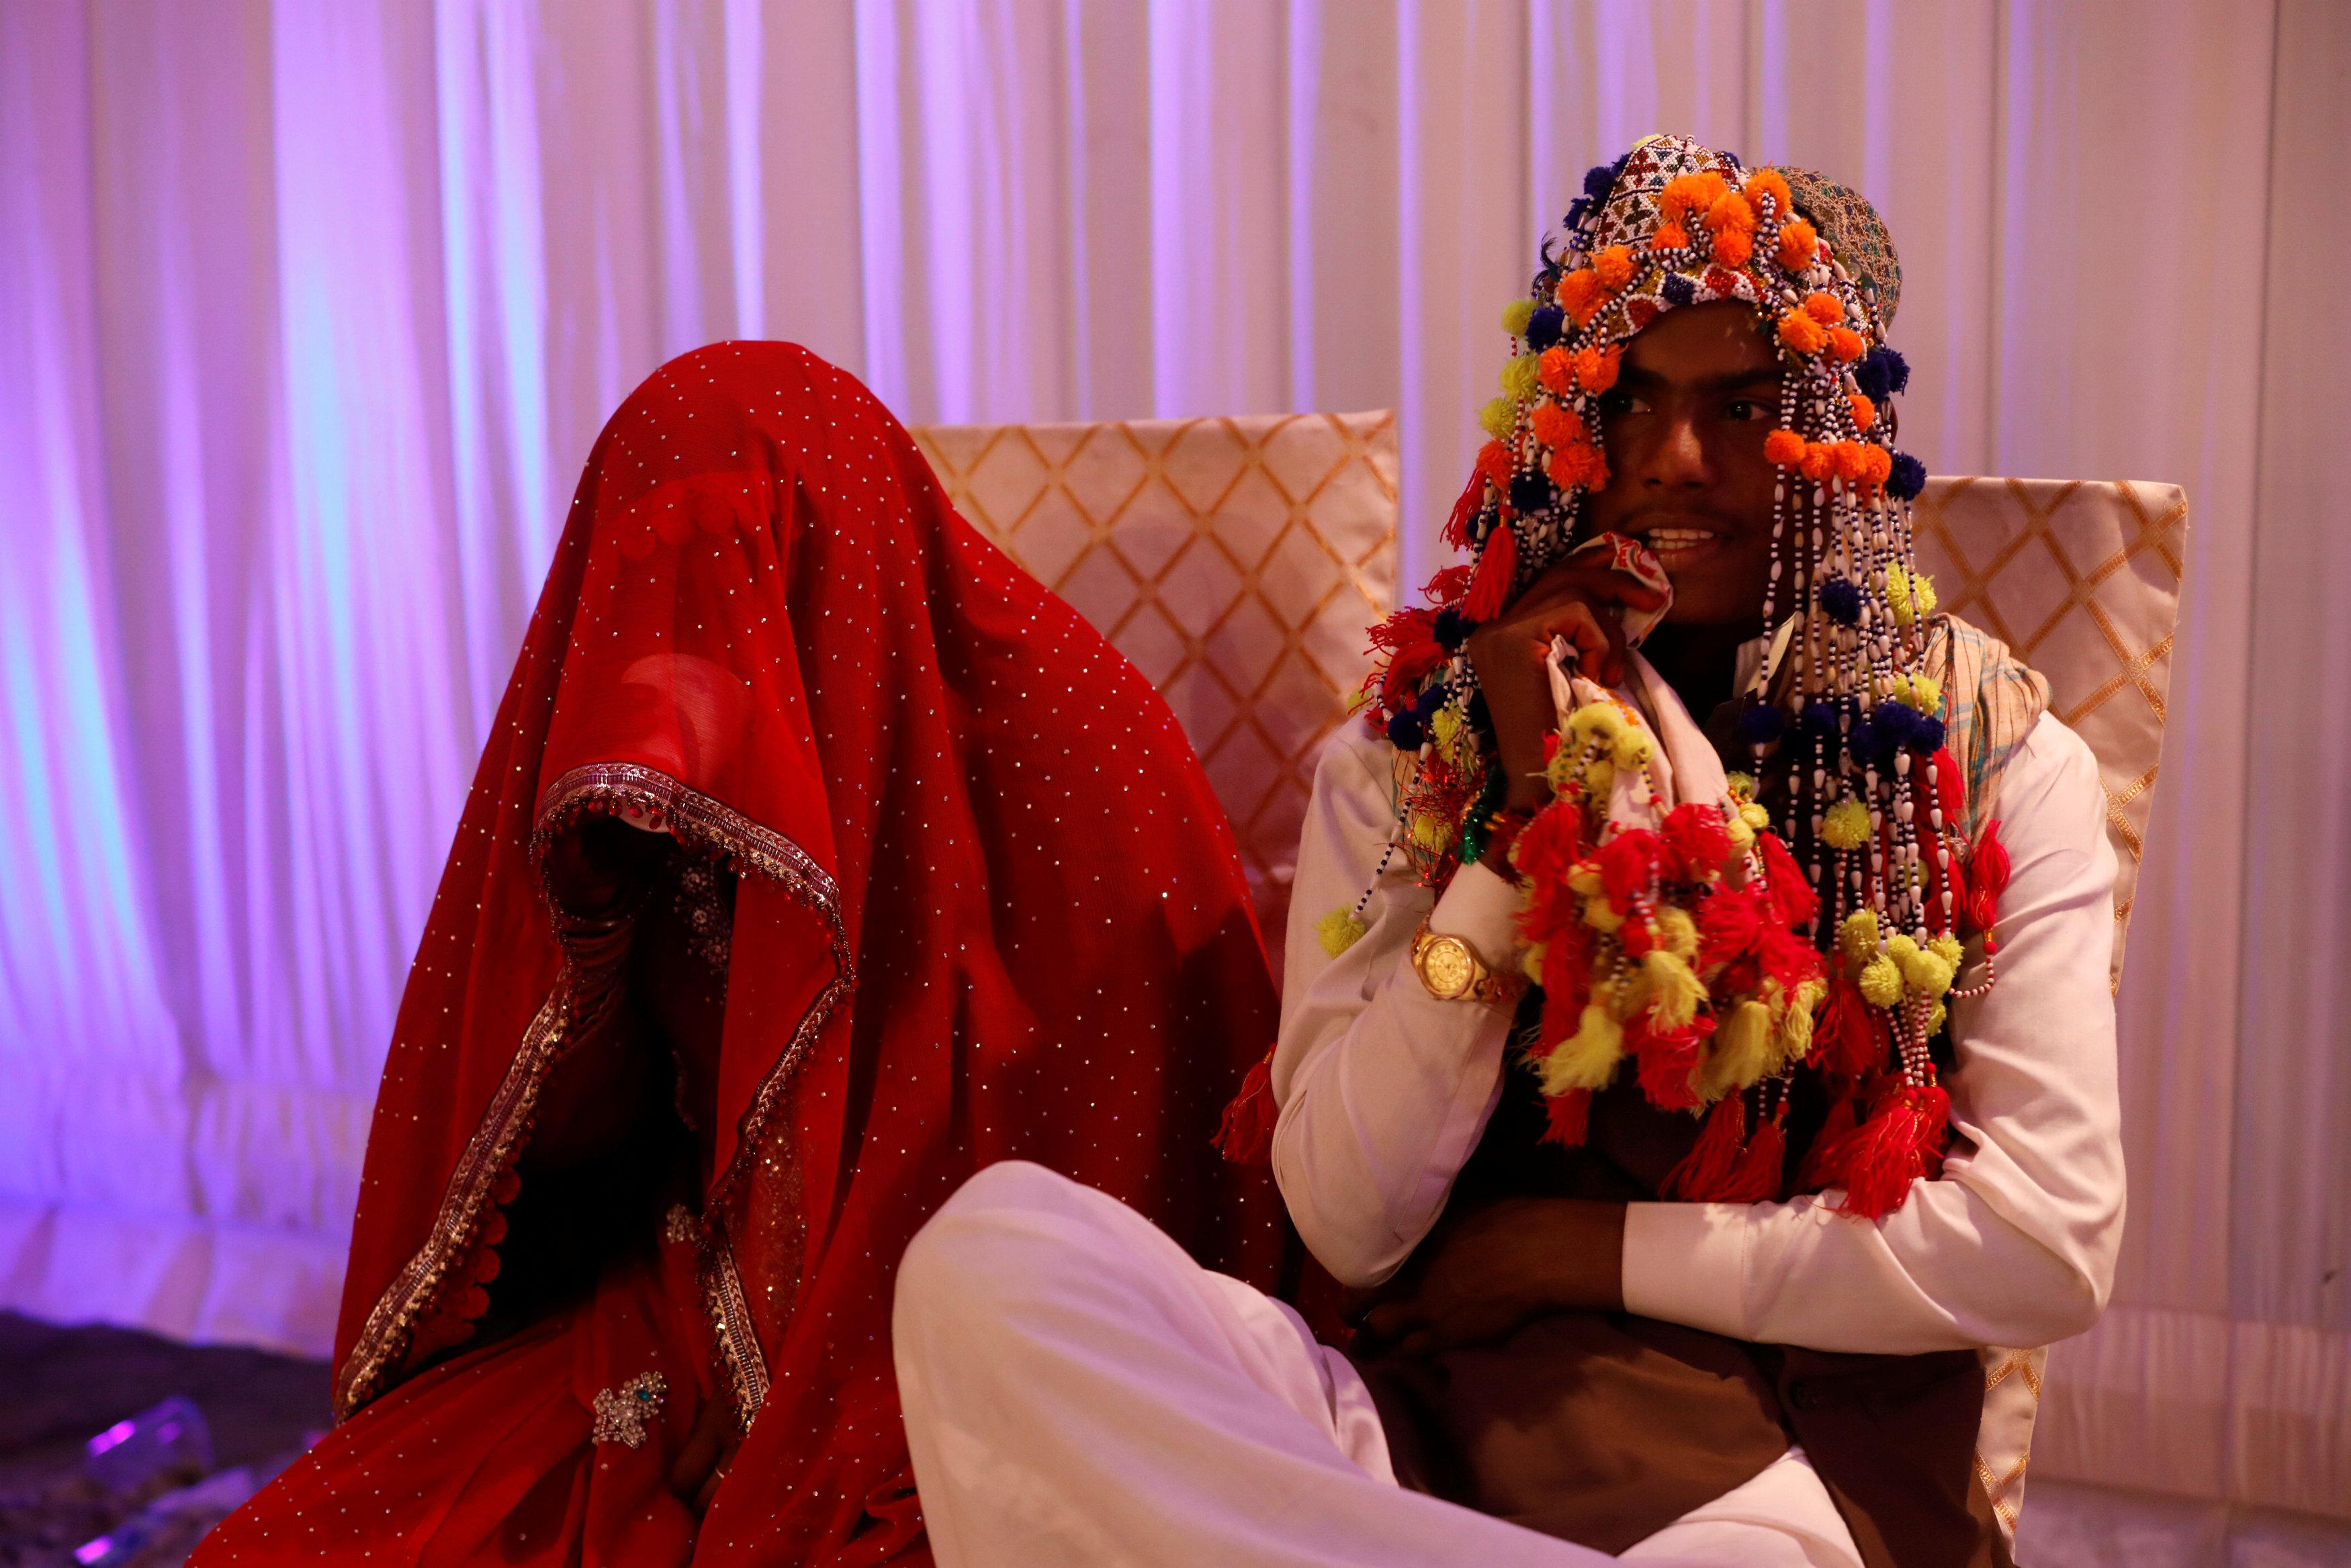 حفل زفاف جماعى للهندوس فى كراتشى (2)